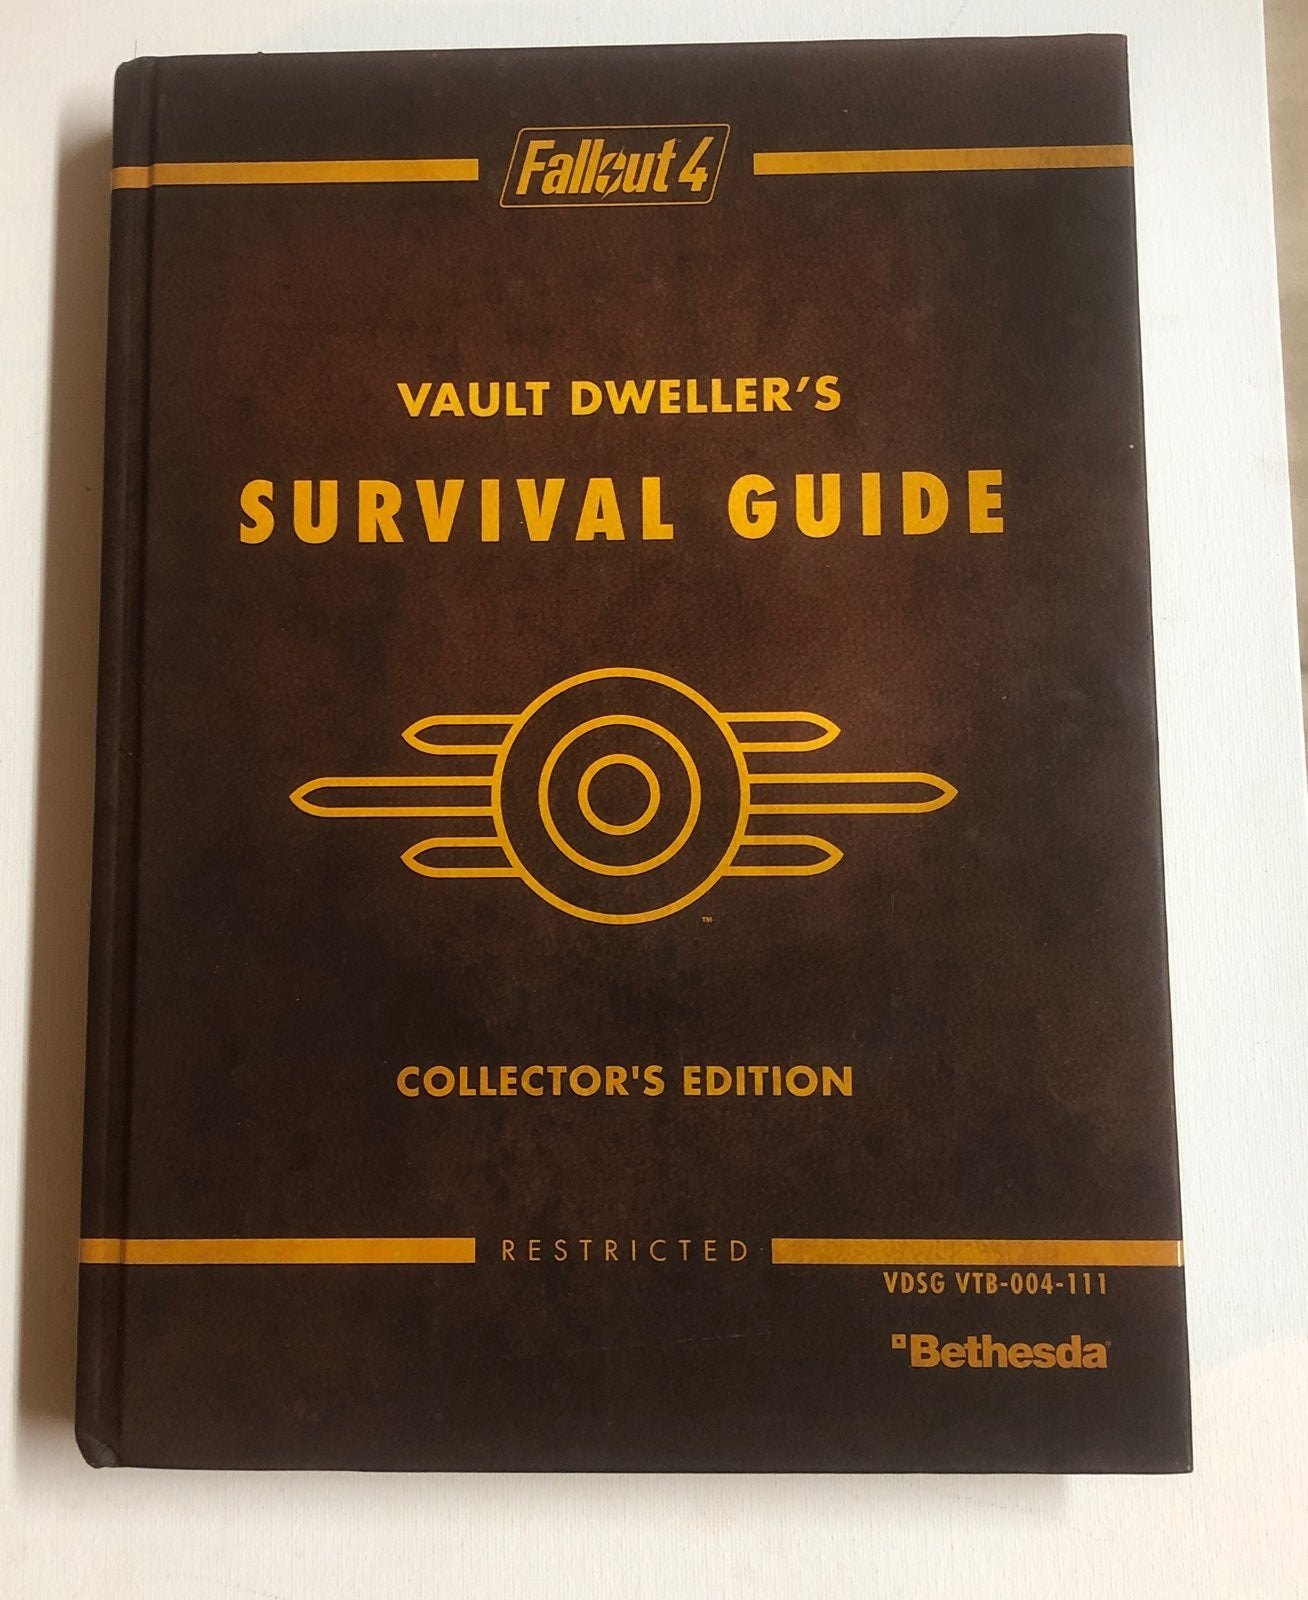 Fallout 4 Collectors Edition Guide